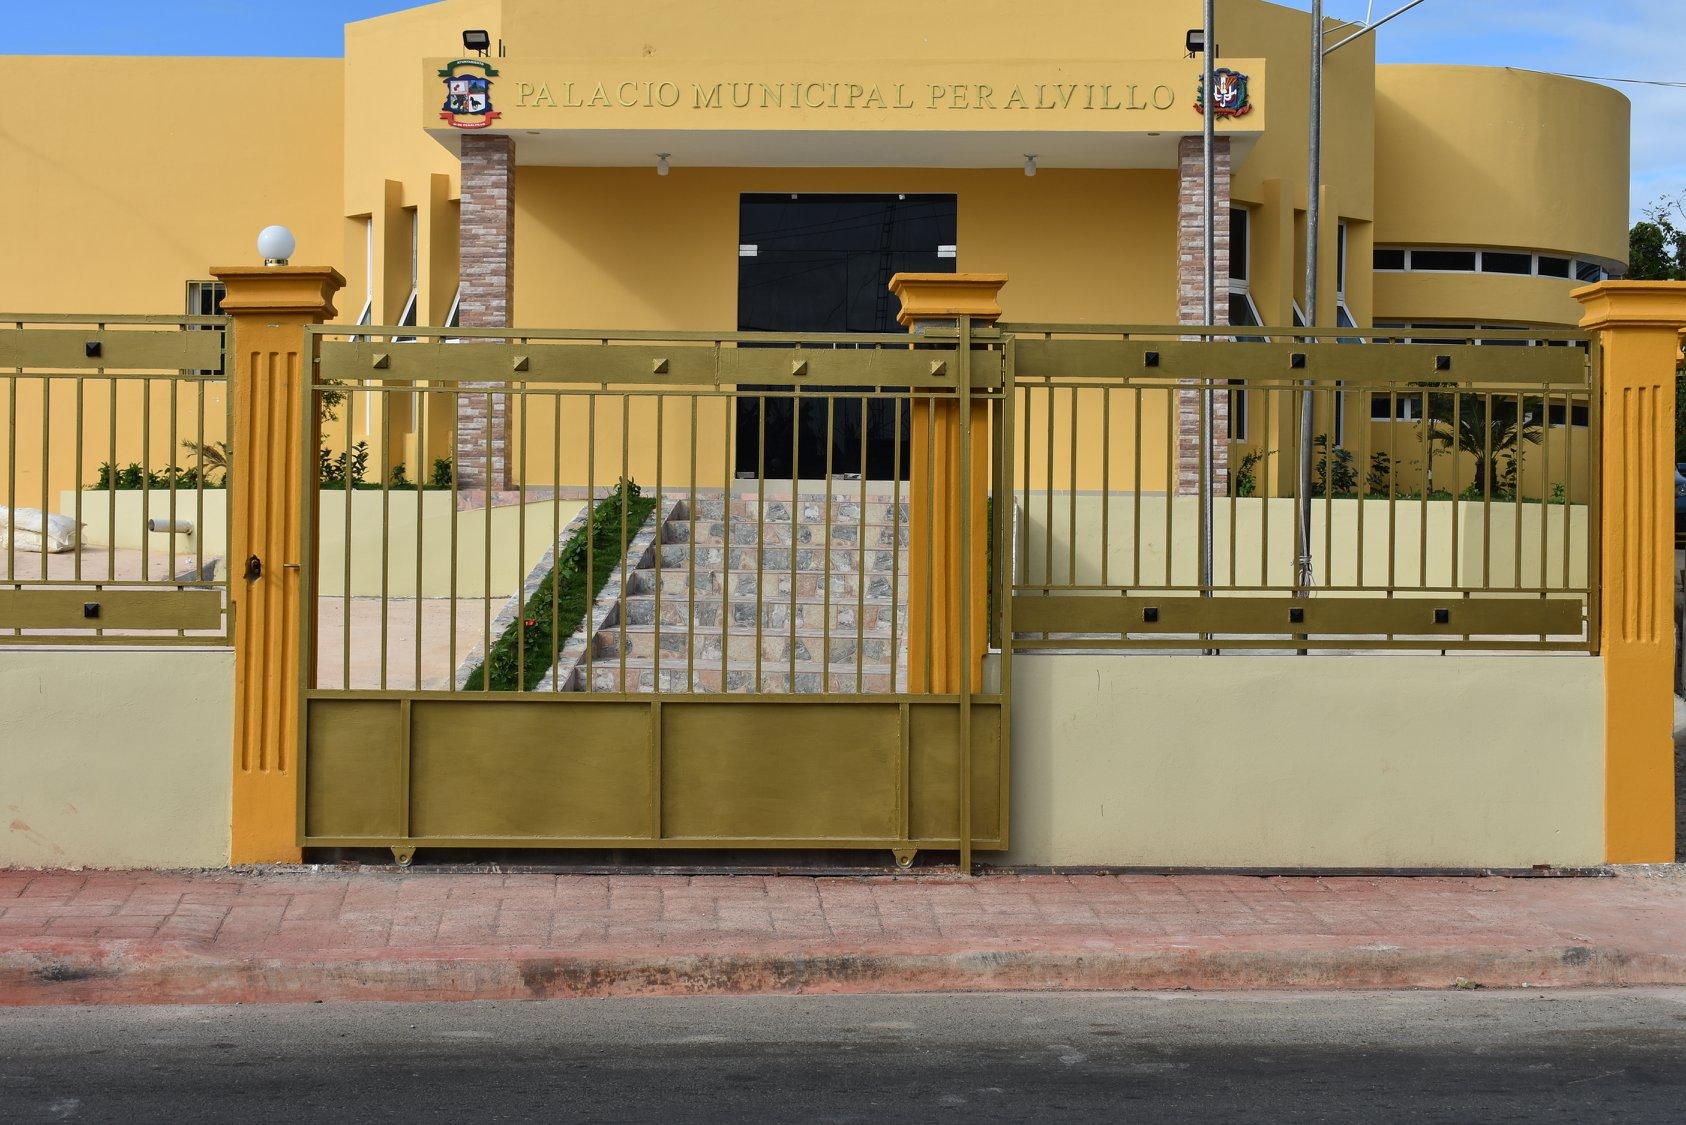 Inauguración Del Palacio Municipal De Peralvillo